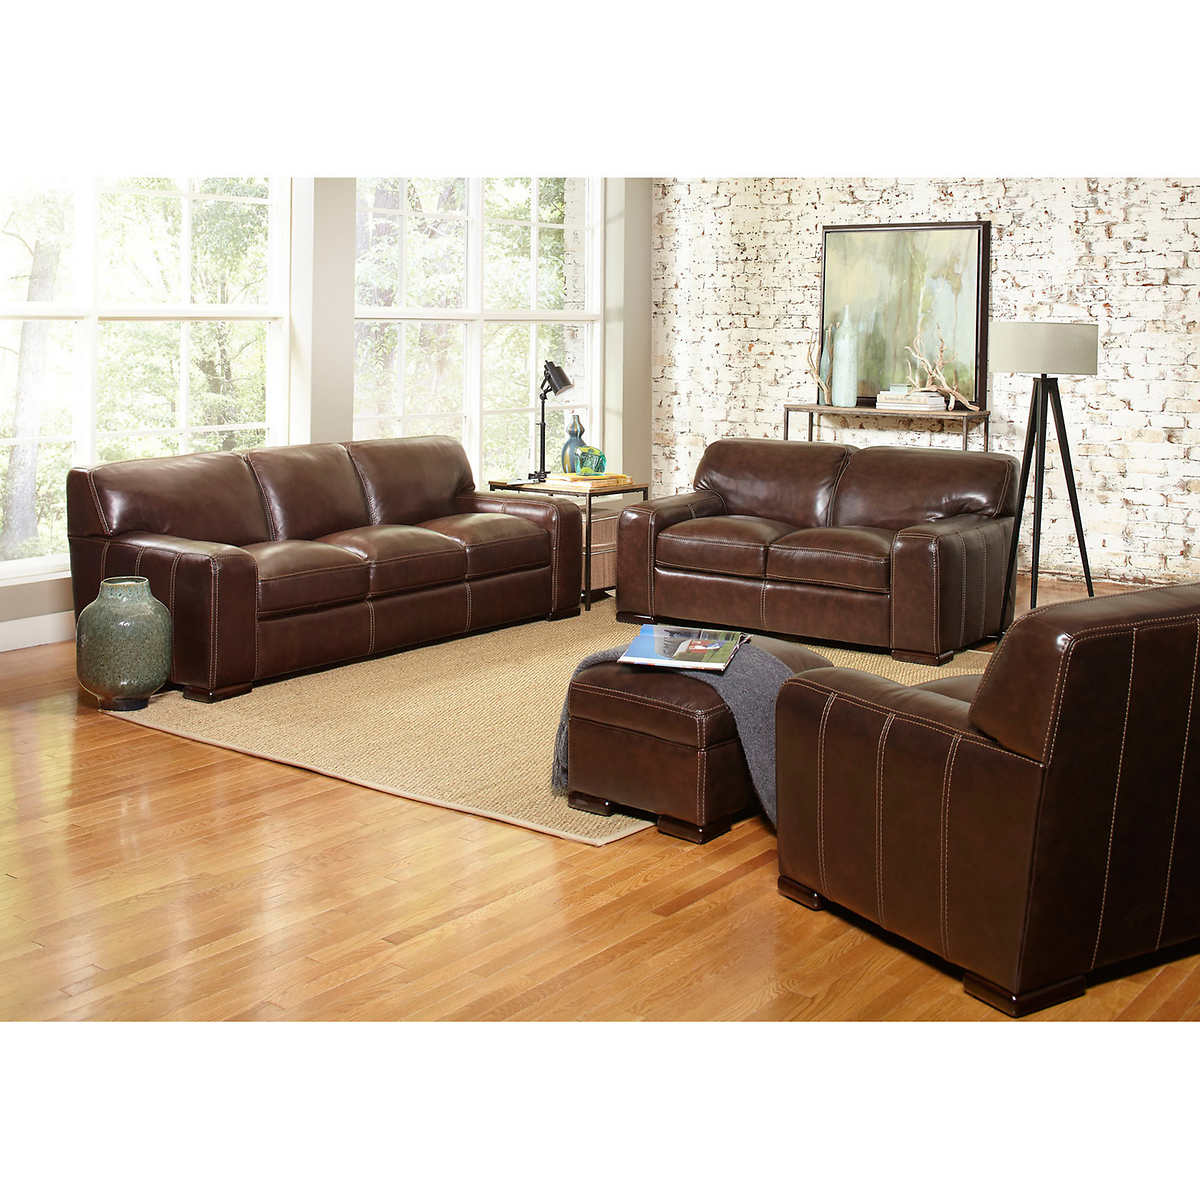 Carreyton 4 Piece Top Grain Leather Living Room Set